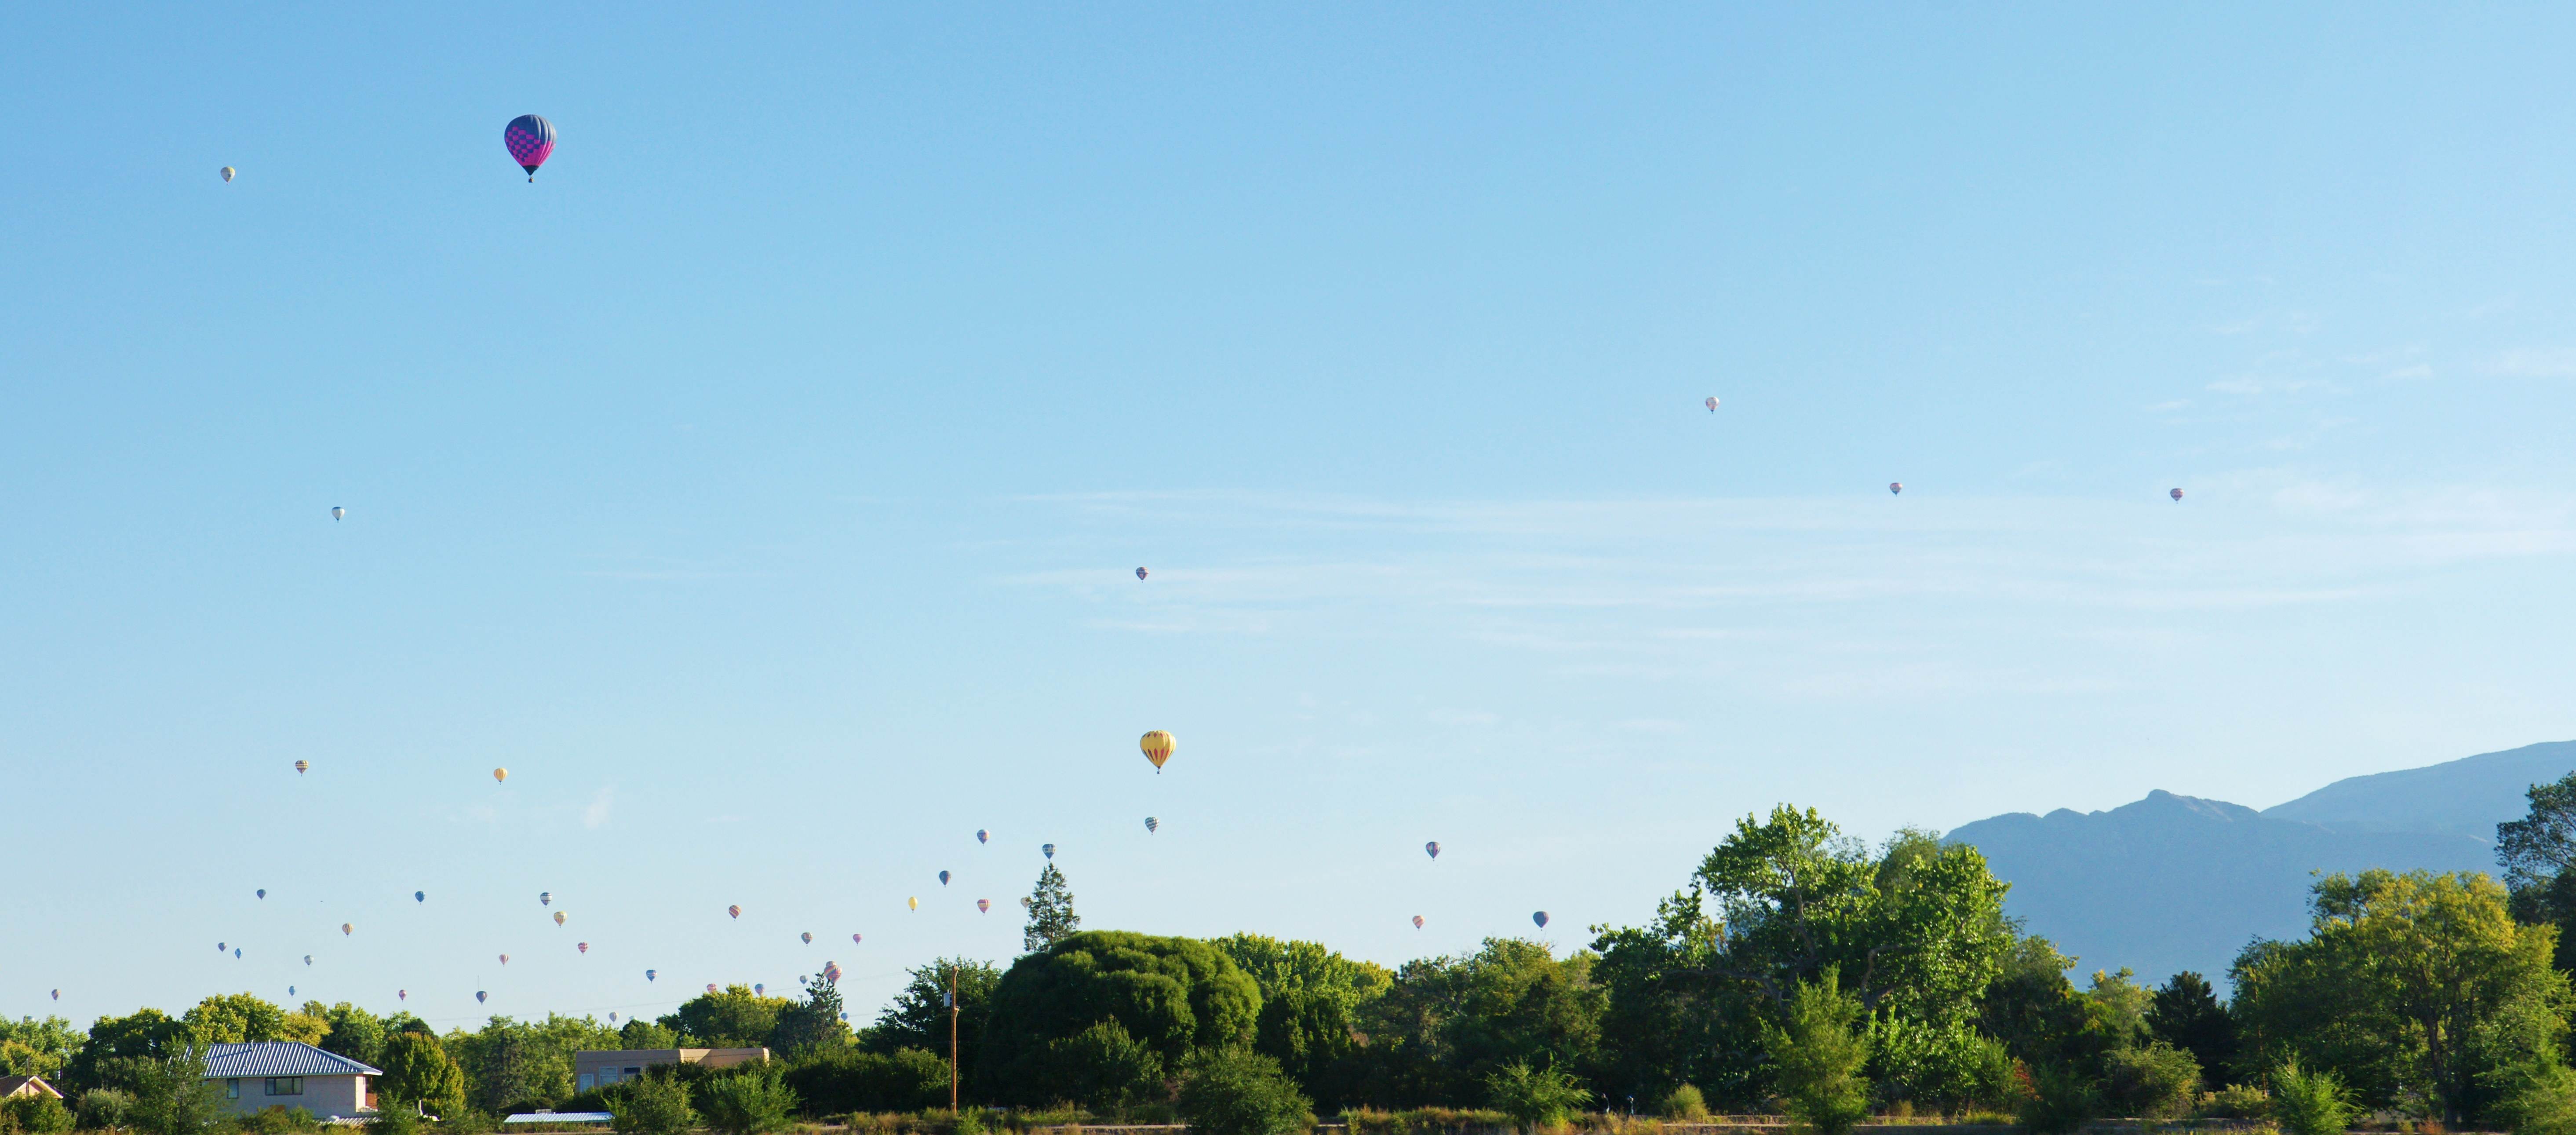 aibf-Balloon-Descent-Gallery08